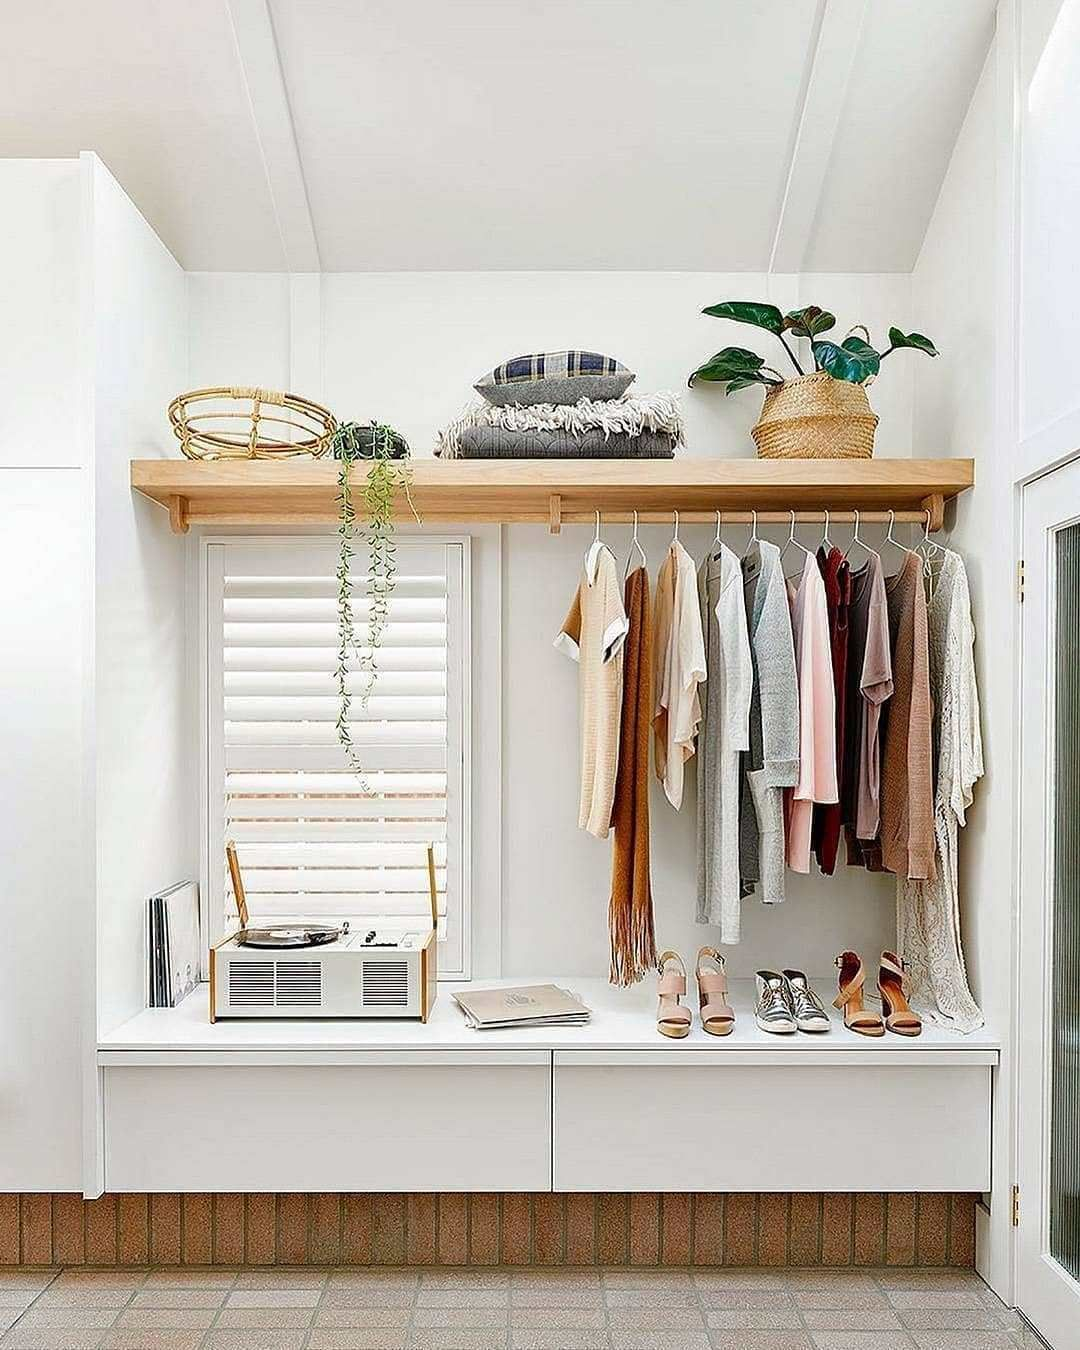 10 Open Closet Ideas For Small Bedrooms Ten Catalog Closet Small Bedroom Closet Ideas For Small Spaces Bedroom Small Closet Space